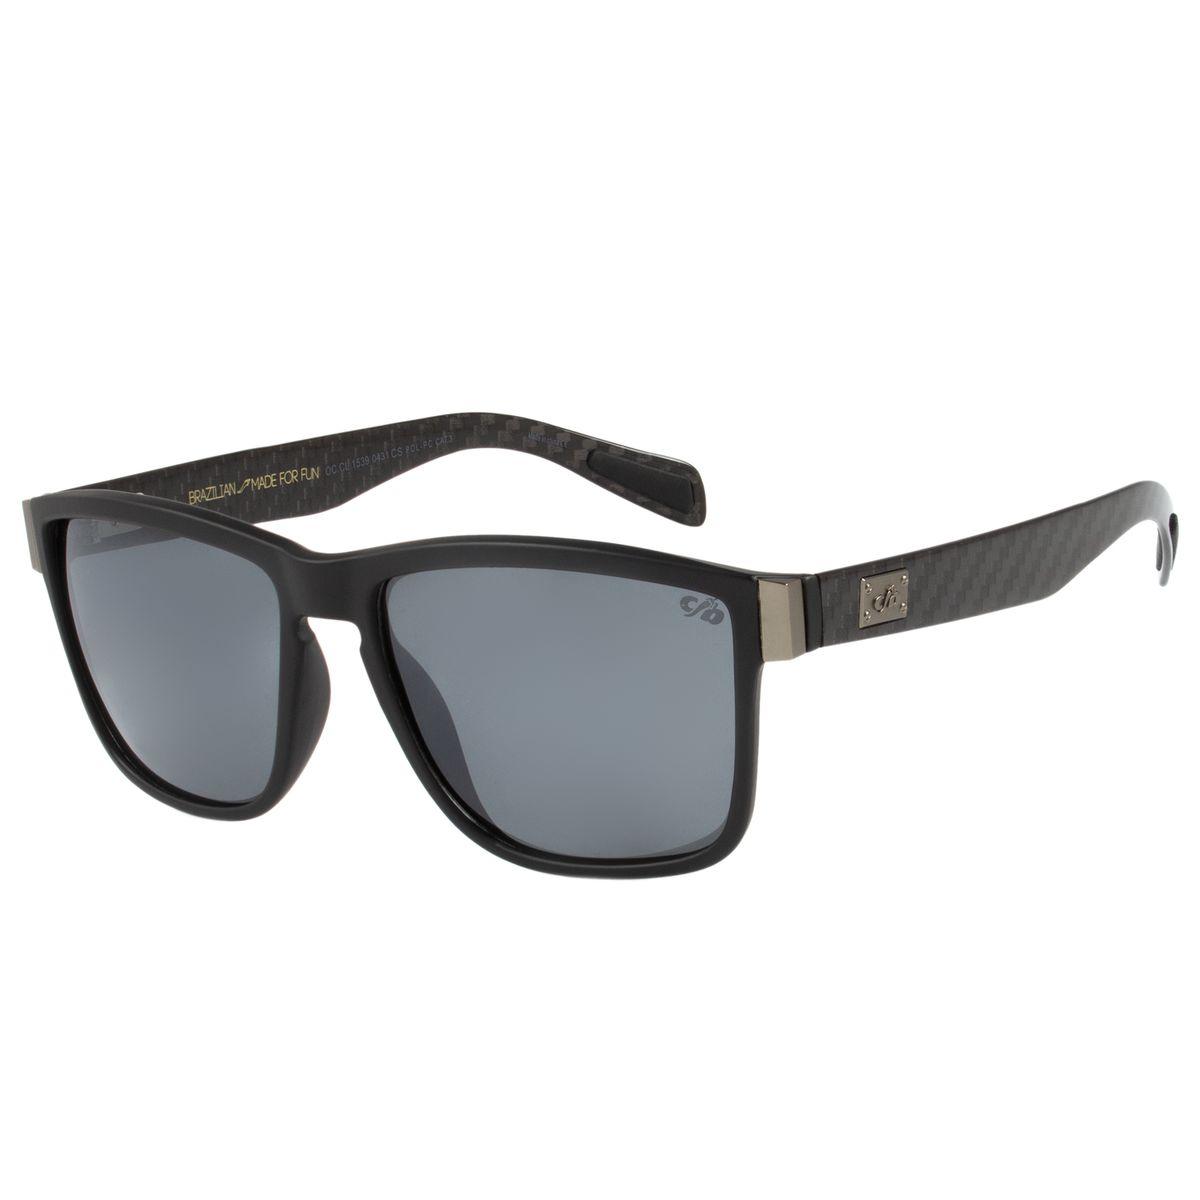 1ac1667e4 Óculos de Sol Masculino Chilli Beans Polarizado Retangular Preto ...